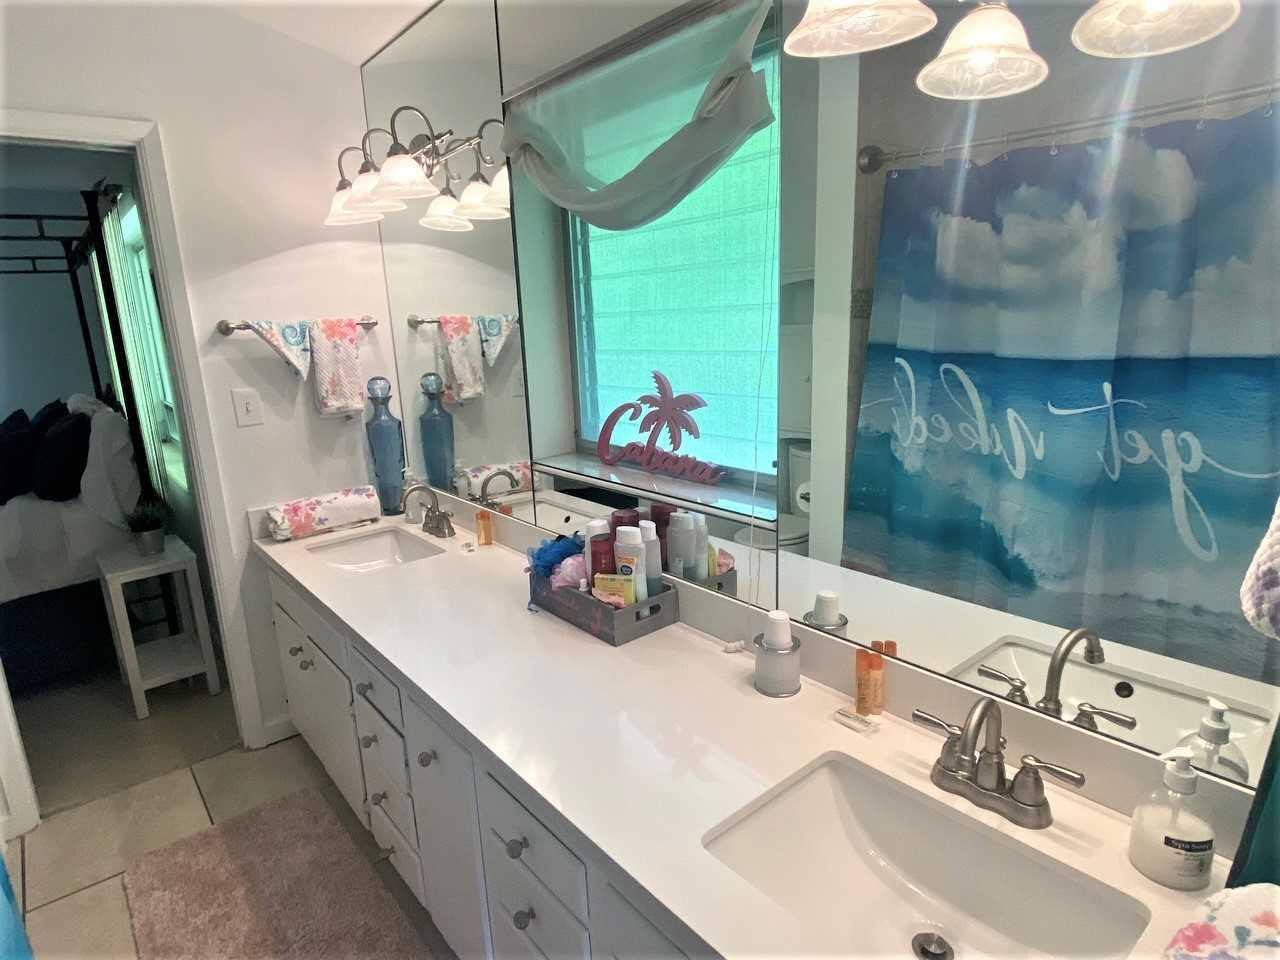 Jack and Jill bathroom has tub/shower combo.